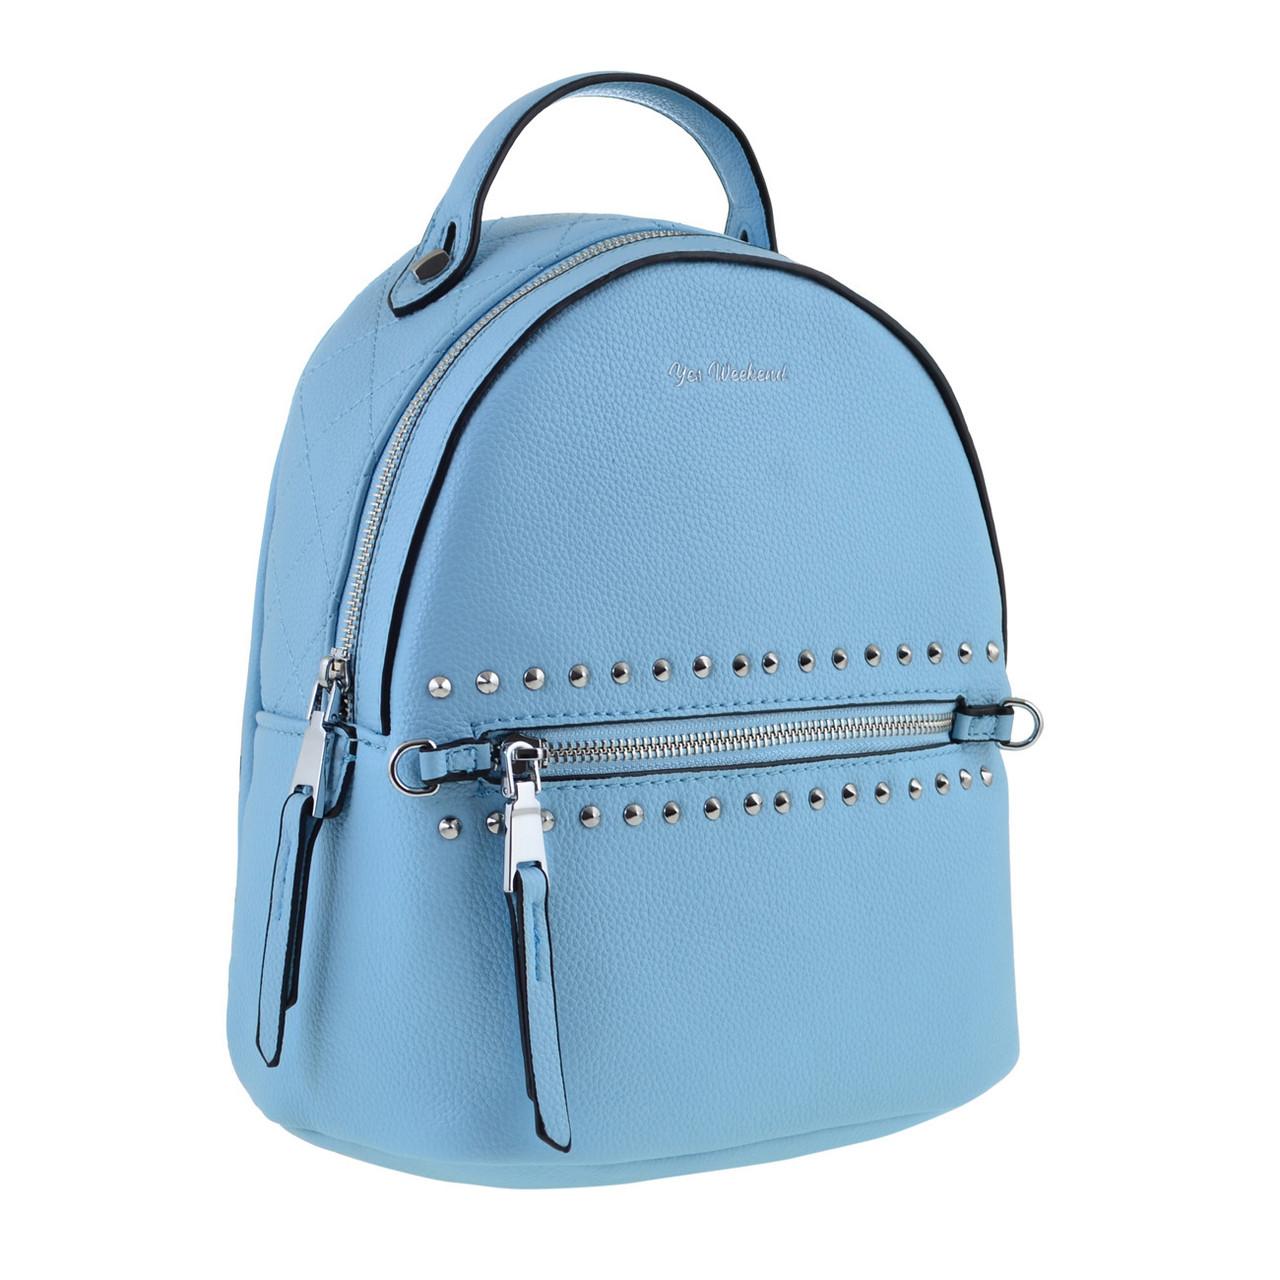 Рюкзак женский YES YW-47 «Bennito» голубой код: 557806